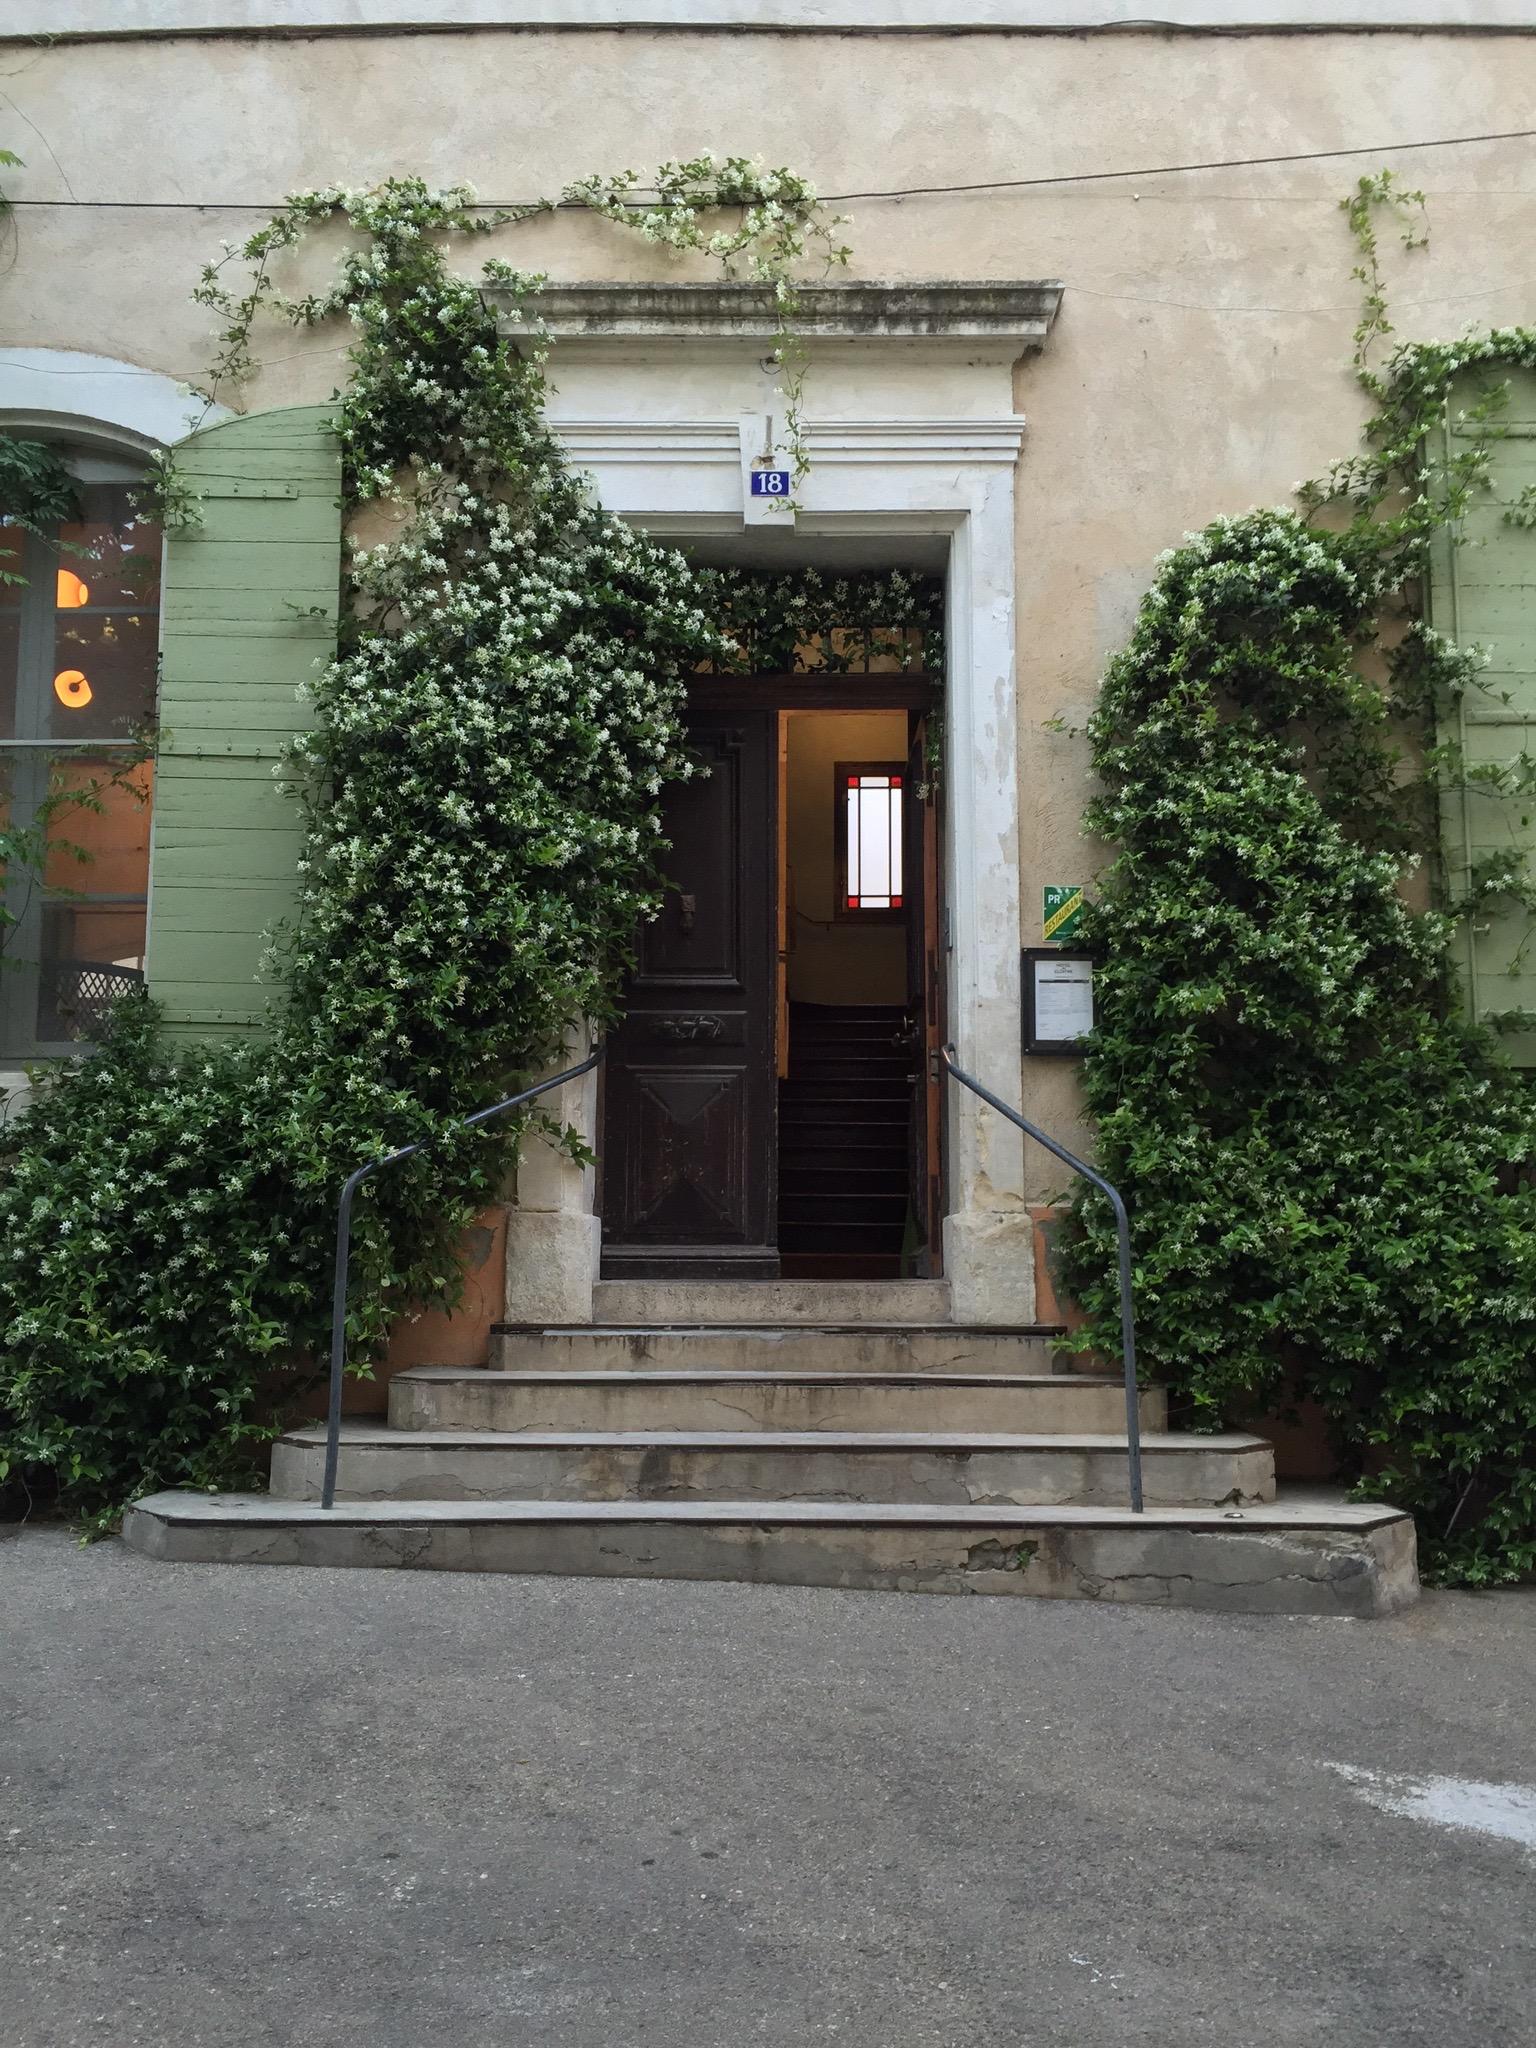 Hotel du Cloitre entrance